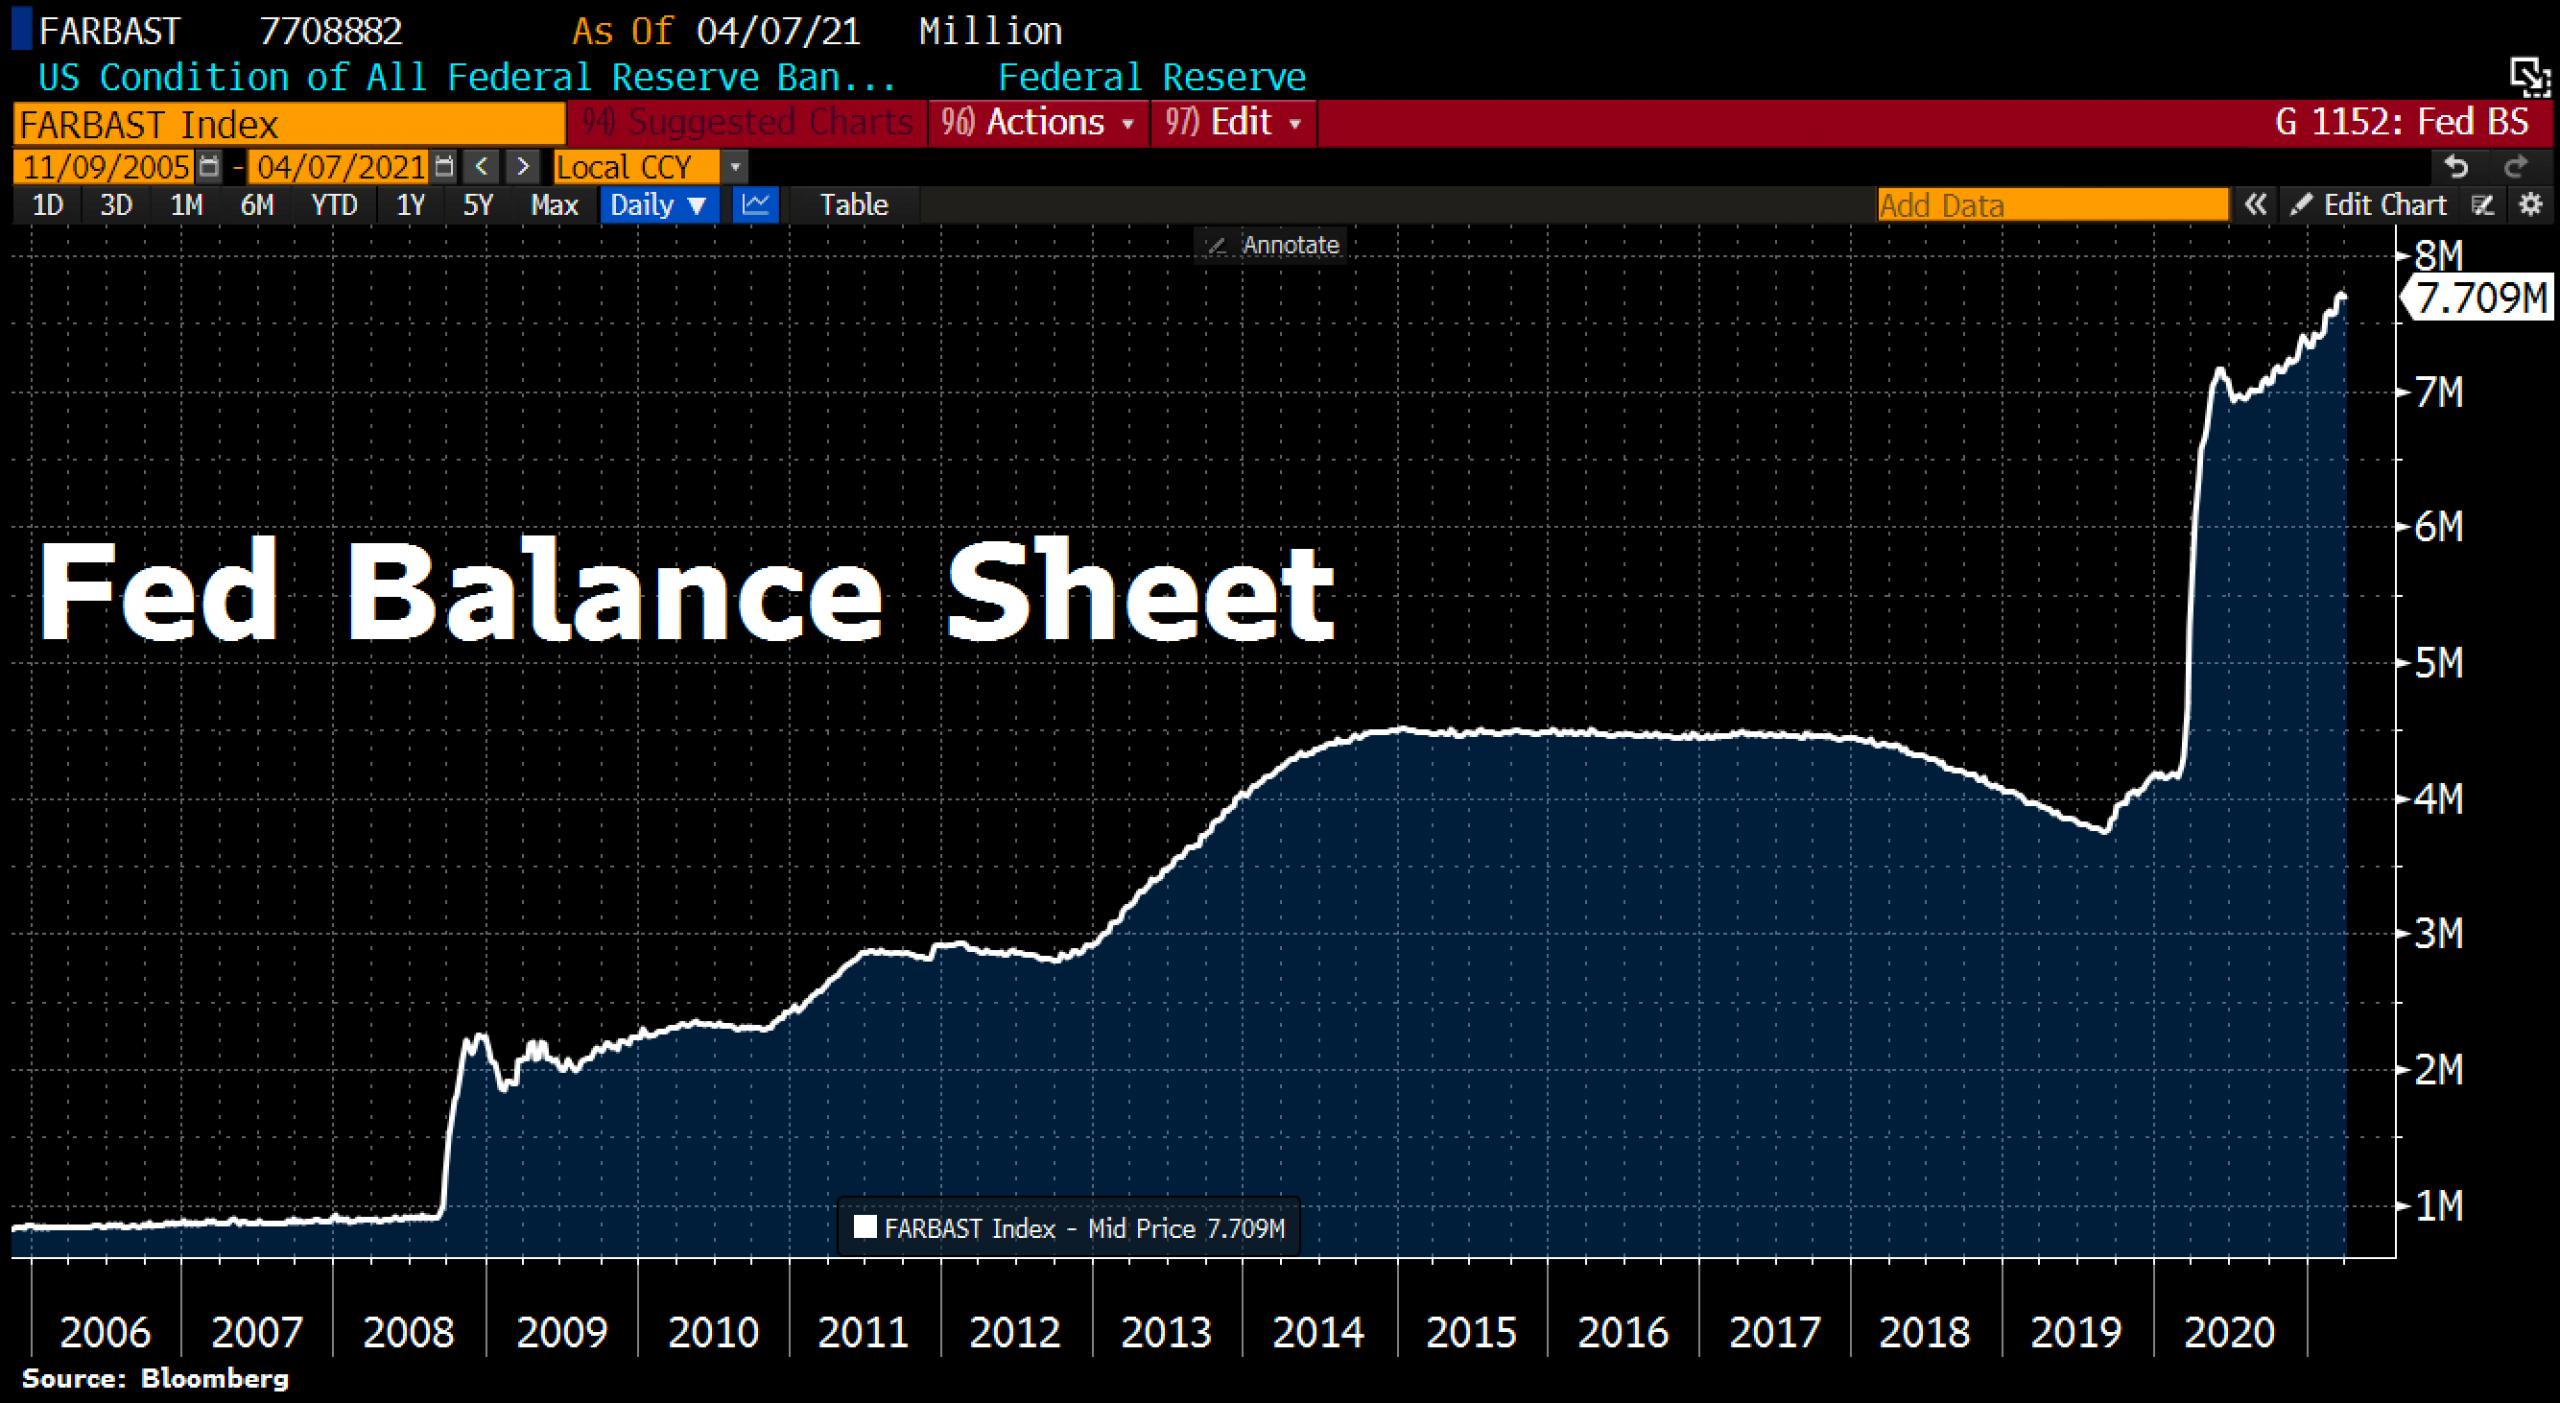 FED Balance Sheet. © Holger Zschaepitz via Twitter @Schuldensuehner, April 9th, 2021.